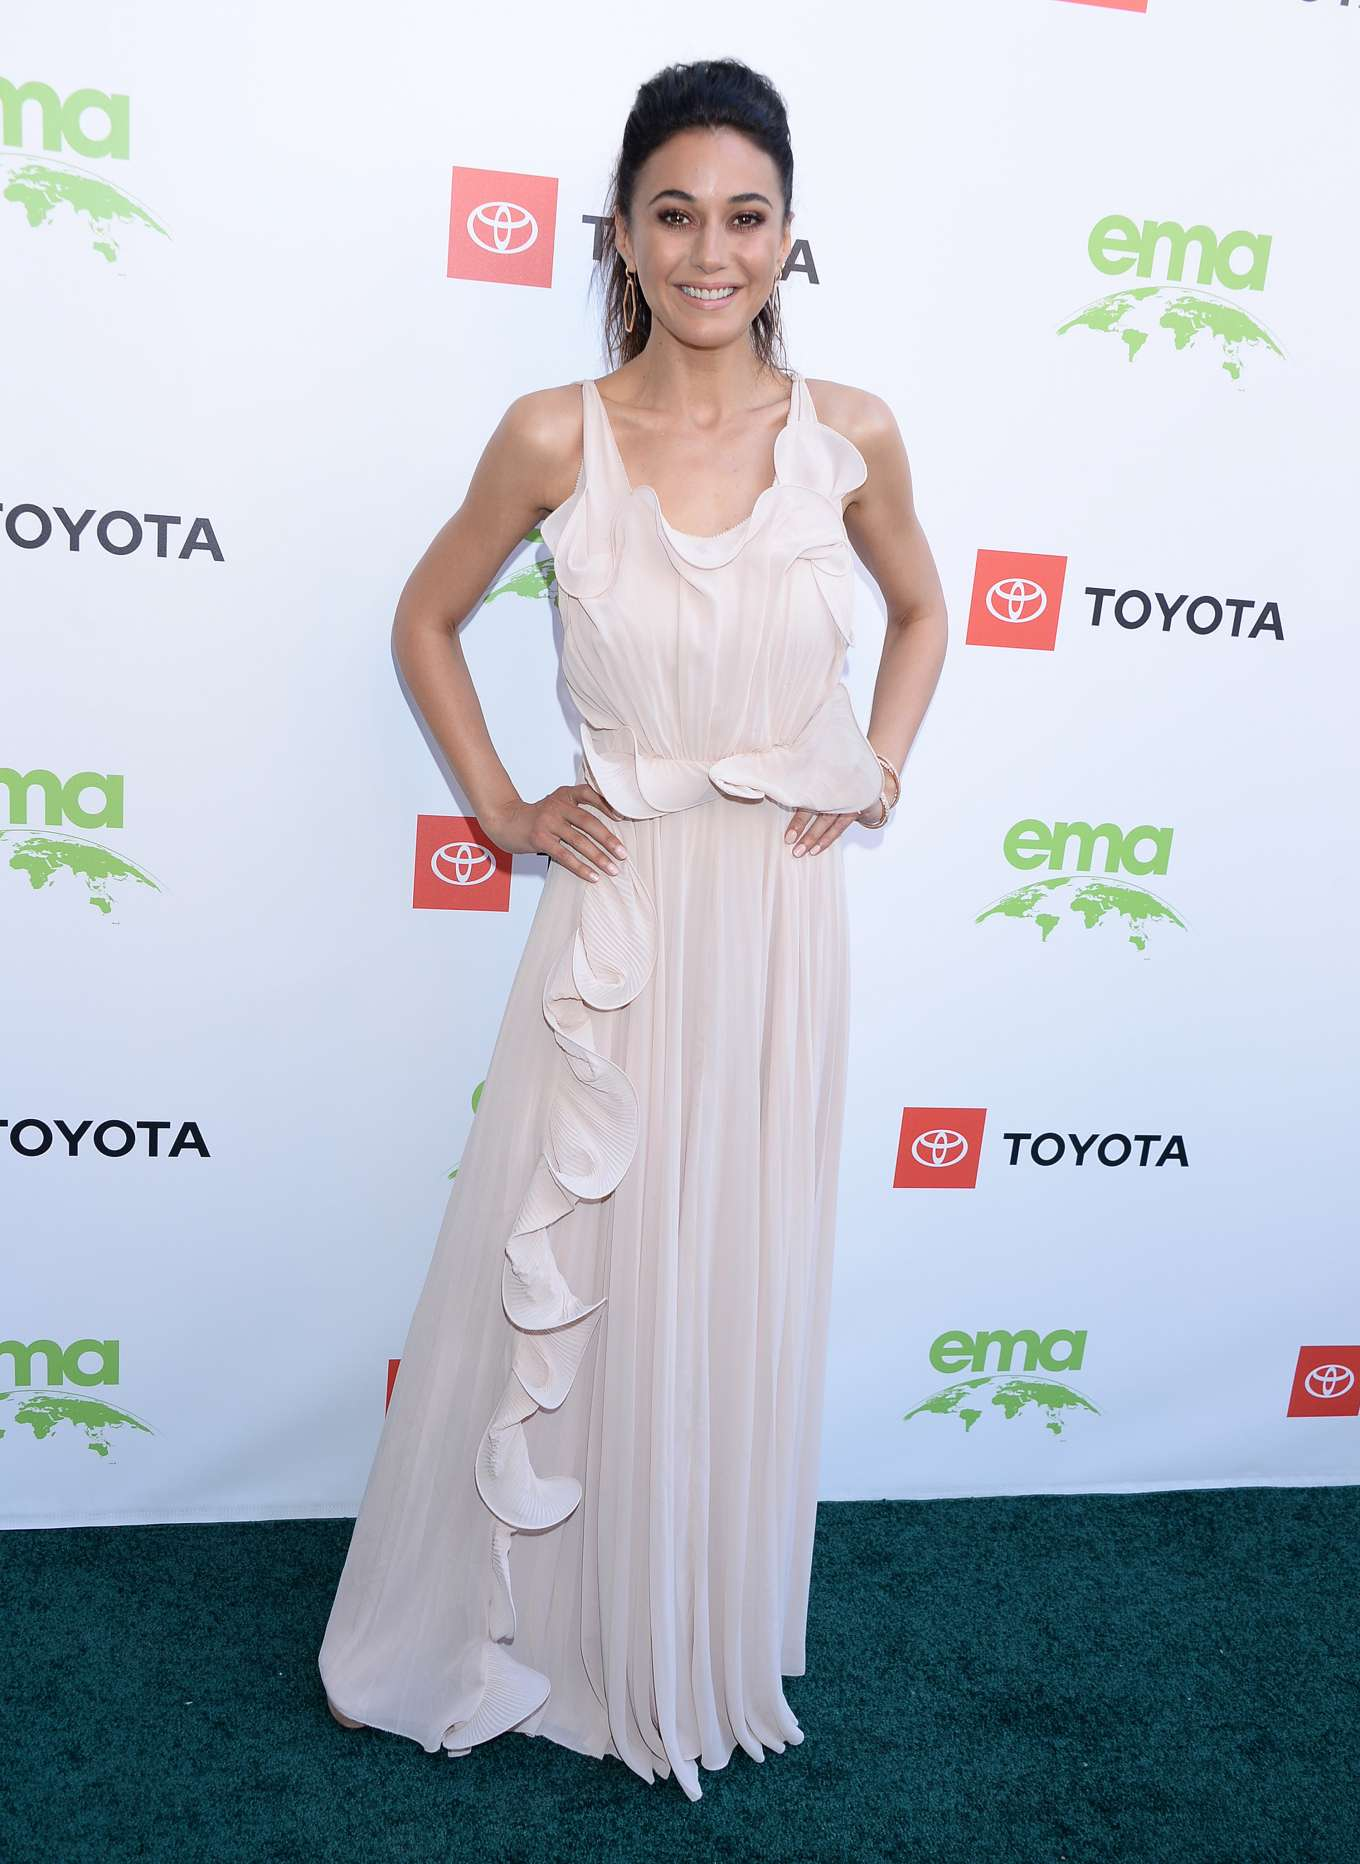 Emmanuelle Chriqui - 29th Annual Environmental Media Awards in Beverly Hills